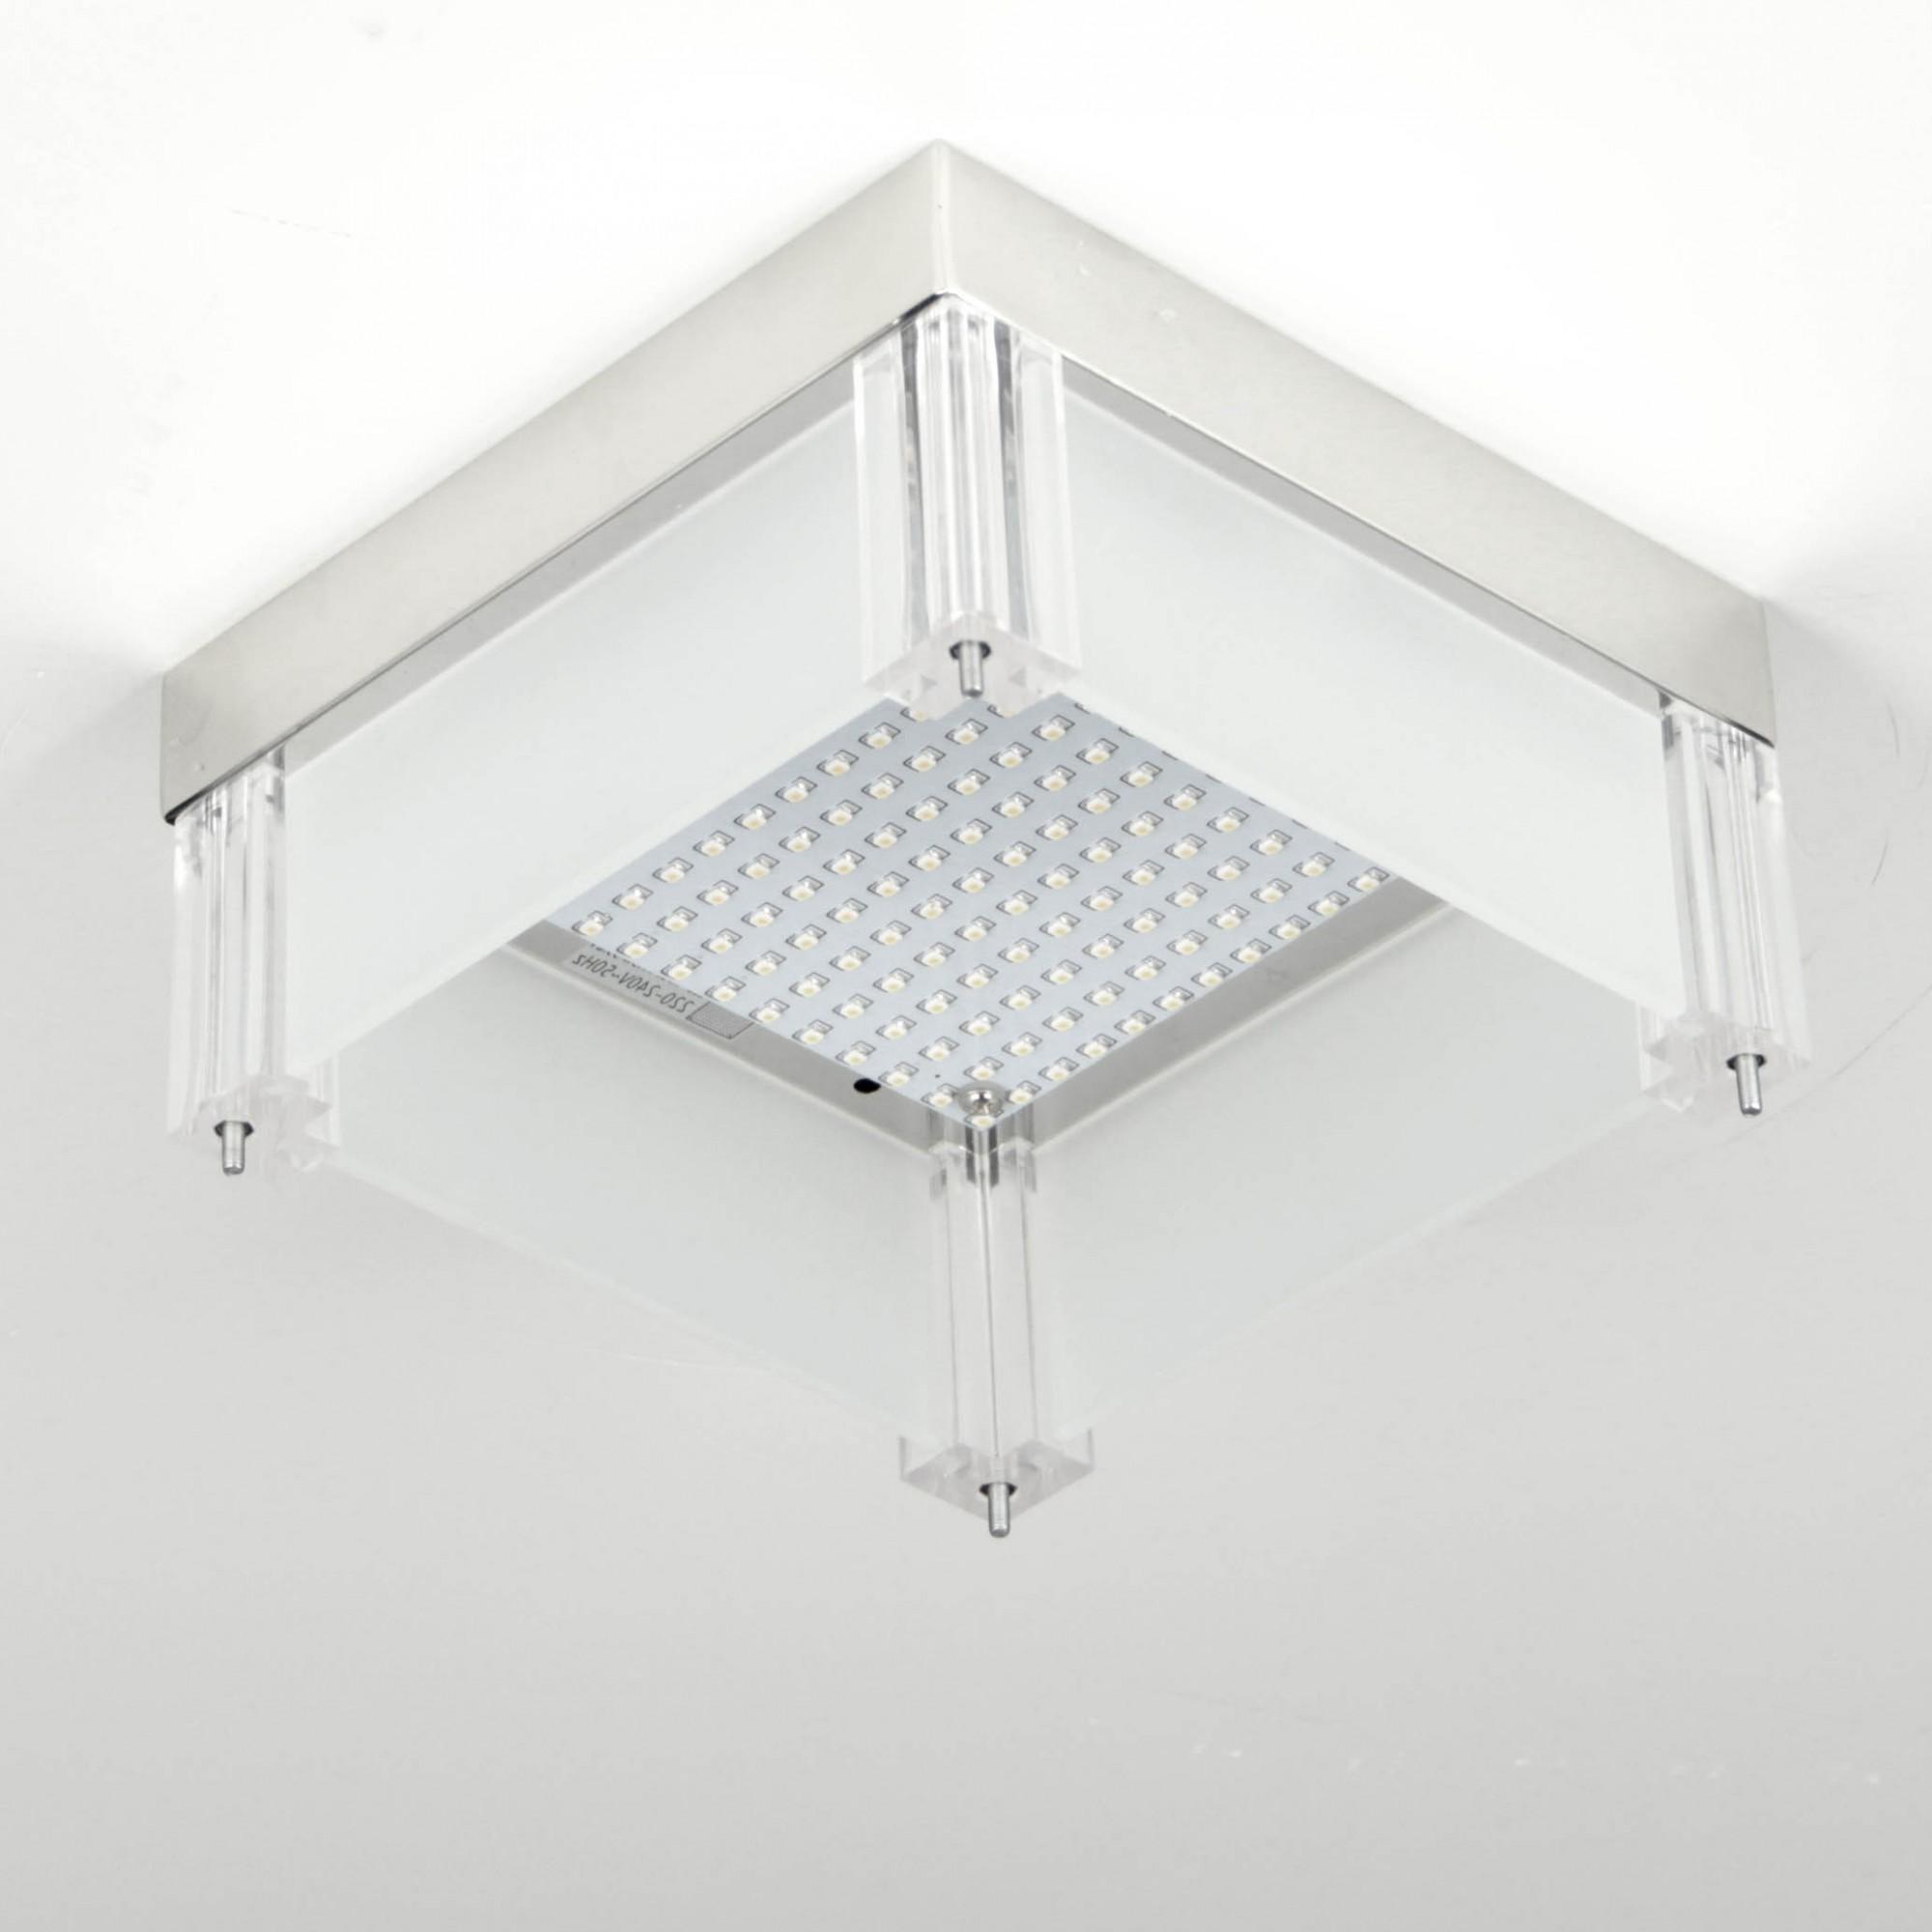 leah led deckenleuchte mit kristallen 28x28 cm 12w. Black Bedroom Furniture Sets. Home Design Ideas